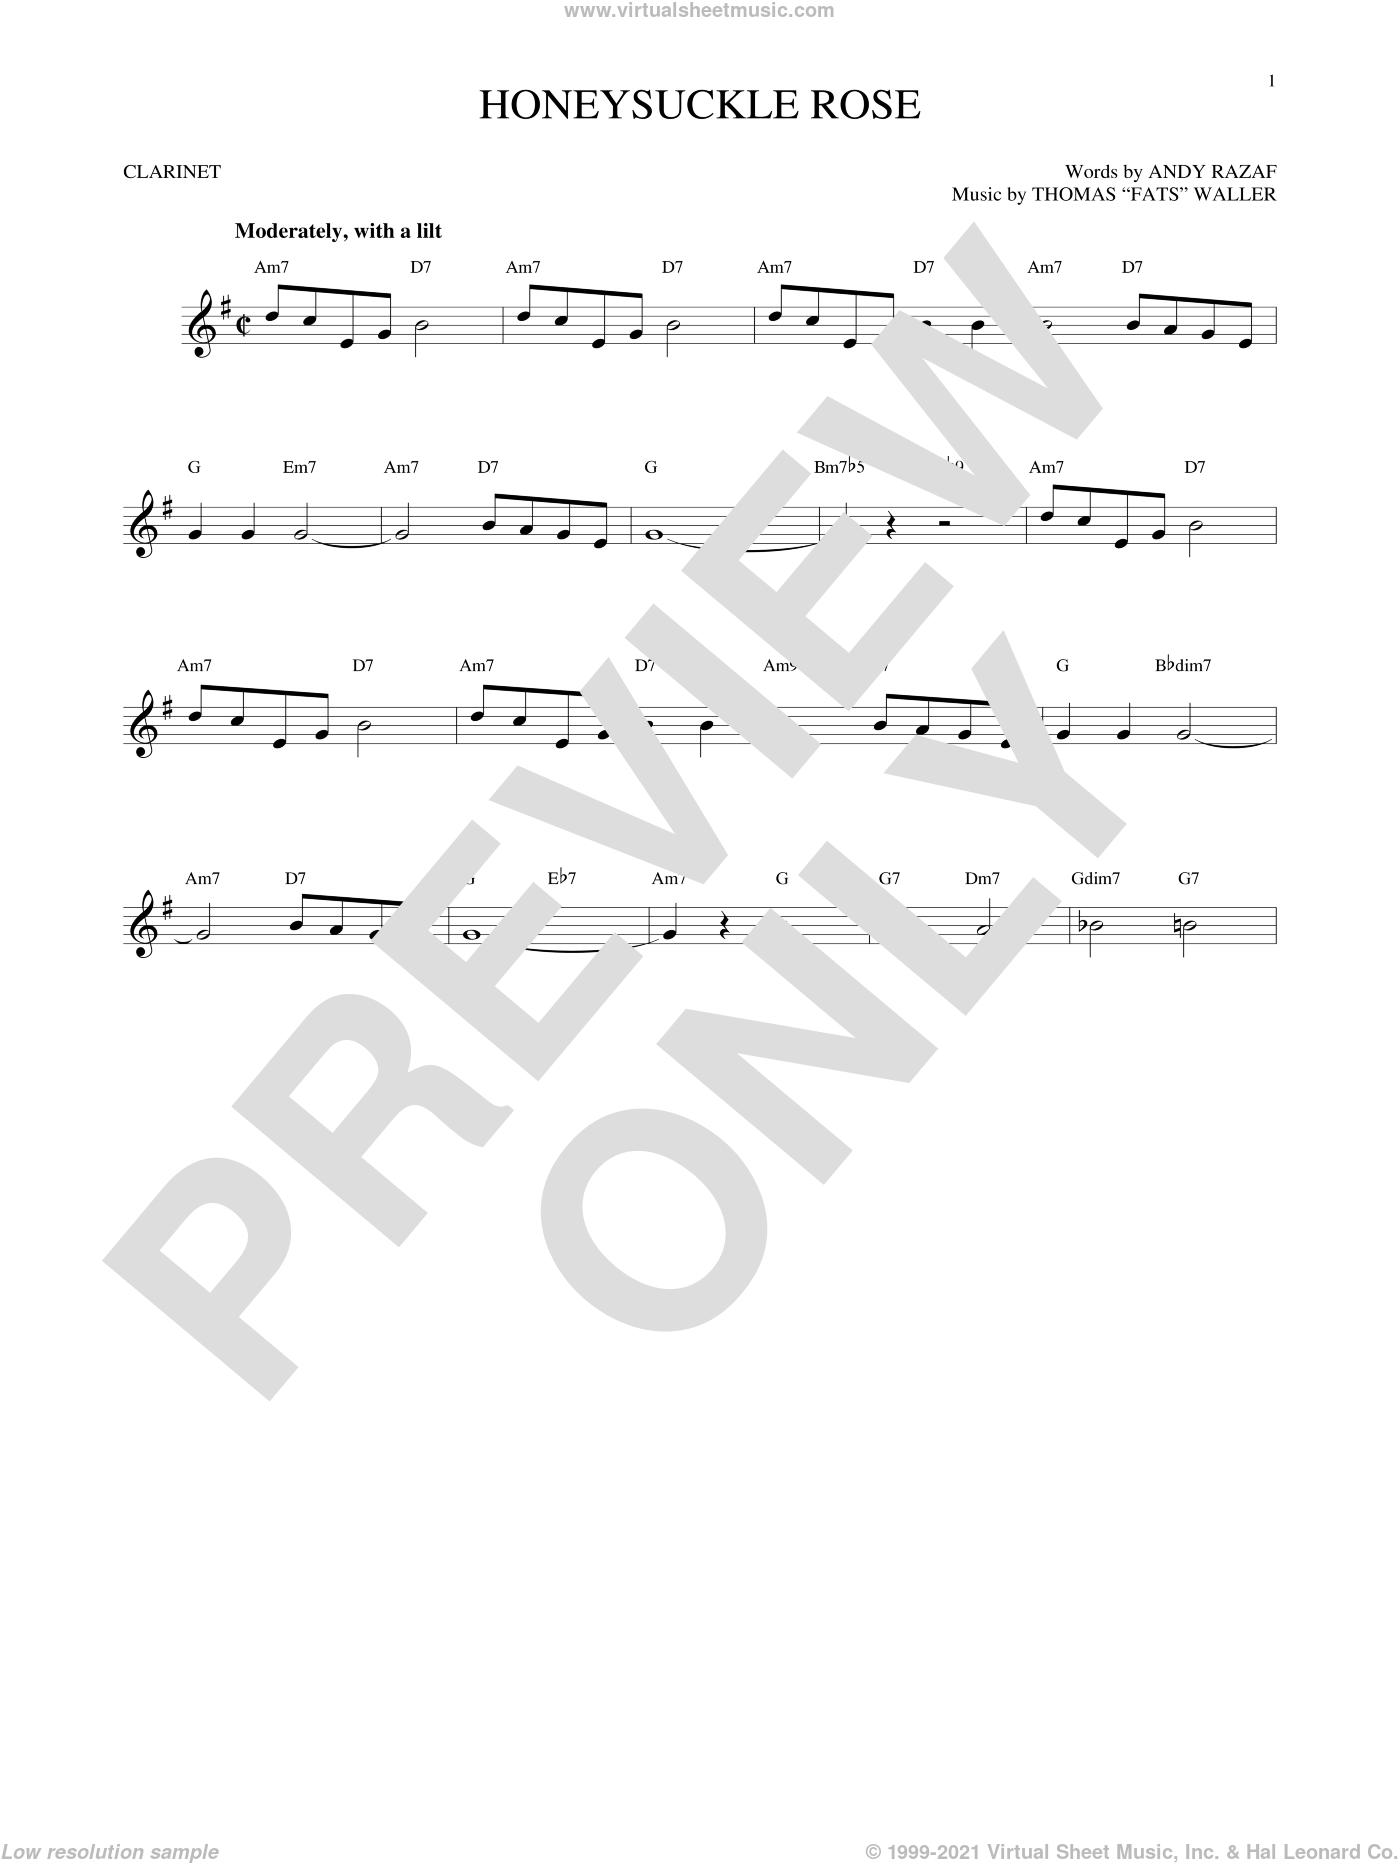 Honeysuckle Rose sheet music for clarinet solo by Andy Razaf, Django Reinhardt and Thomas Waller, intermediate skill level